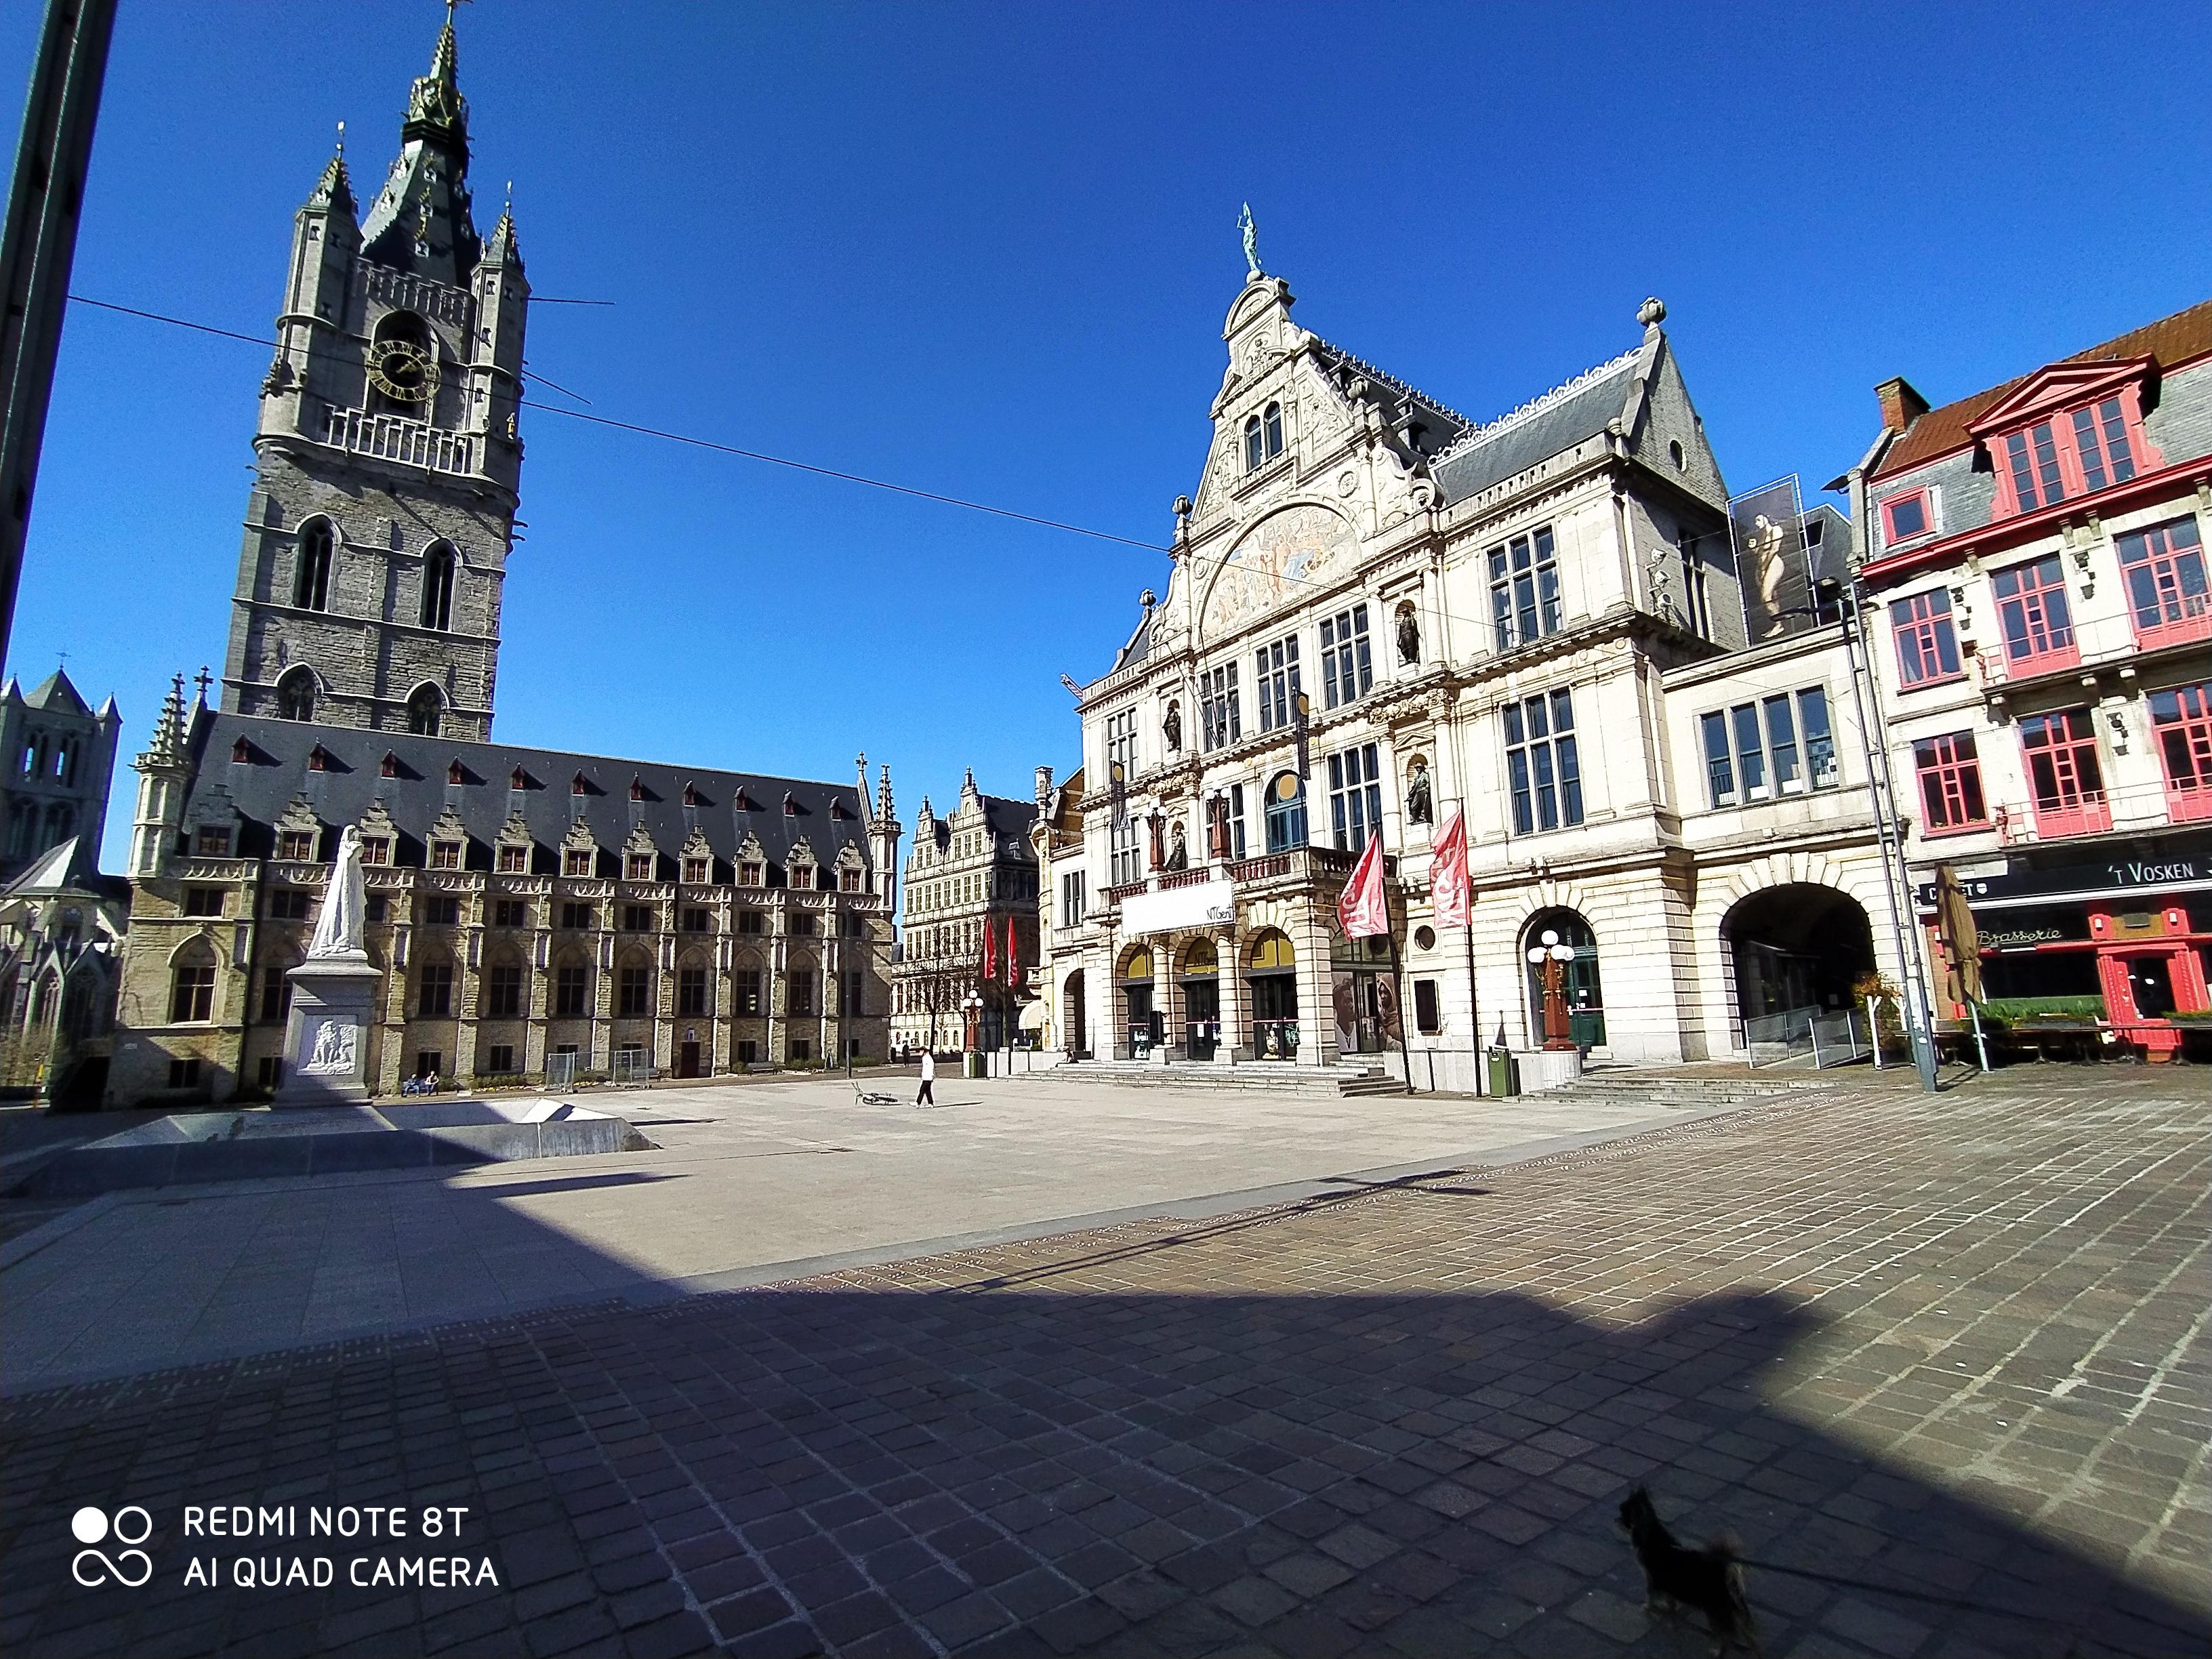 Sint-Baafsplein - Belfort